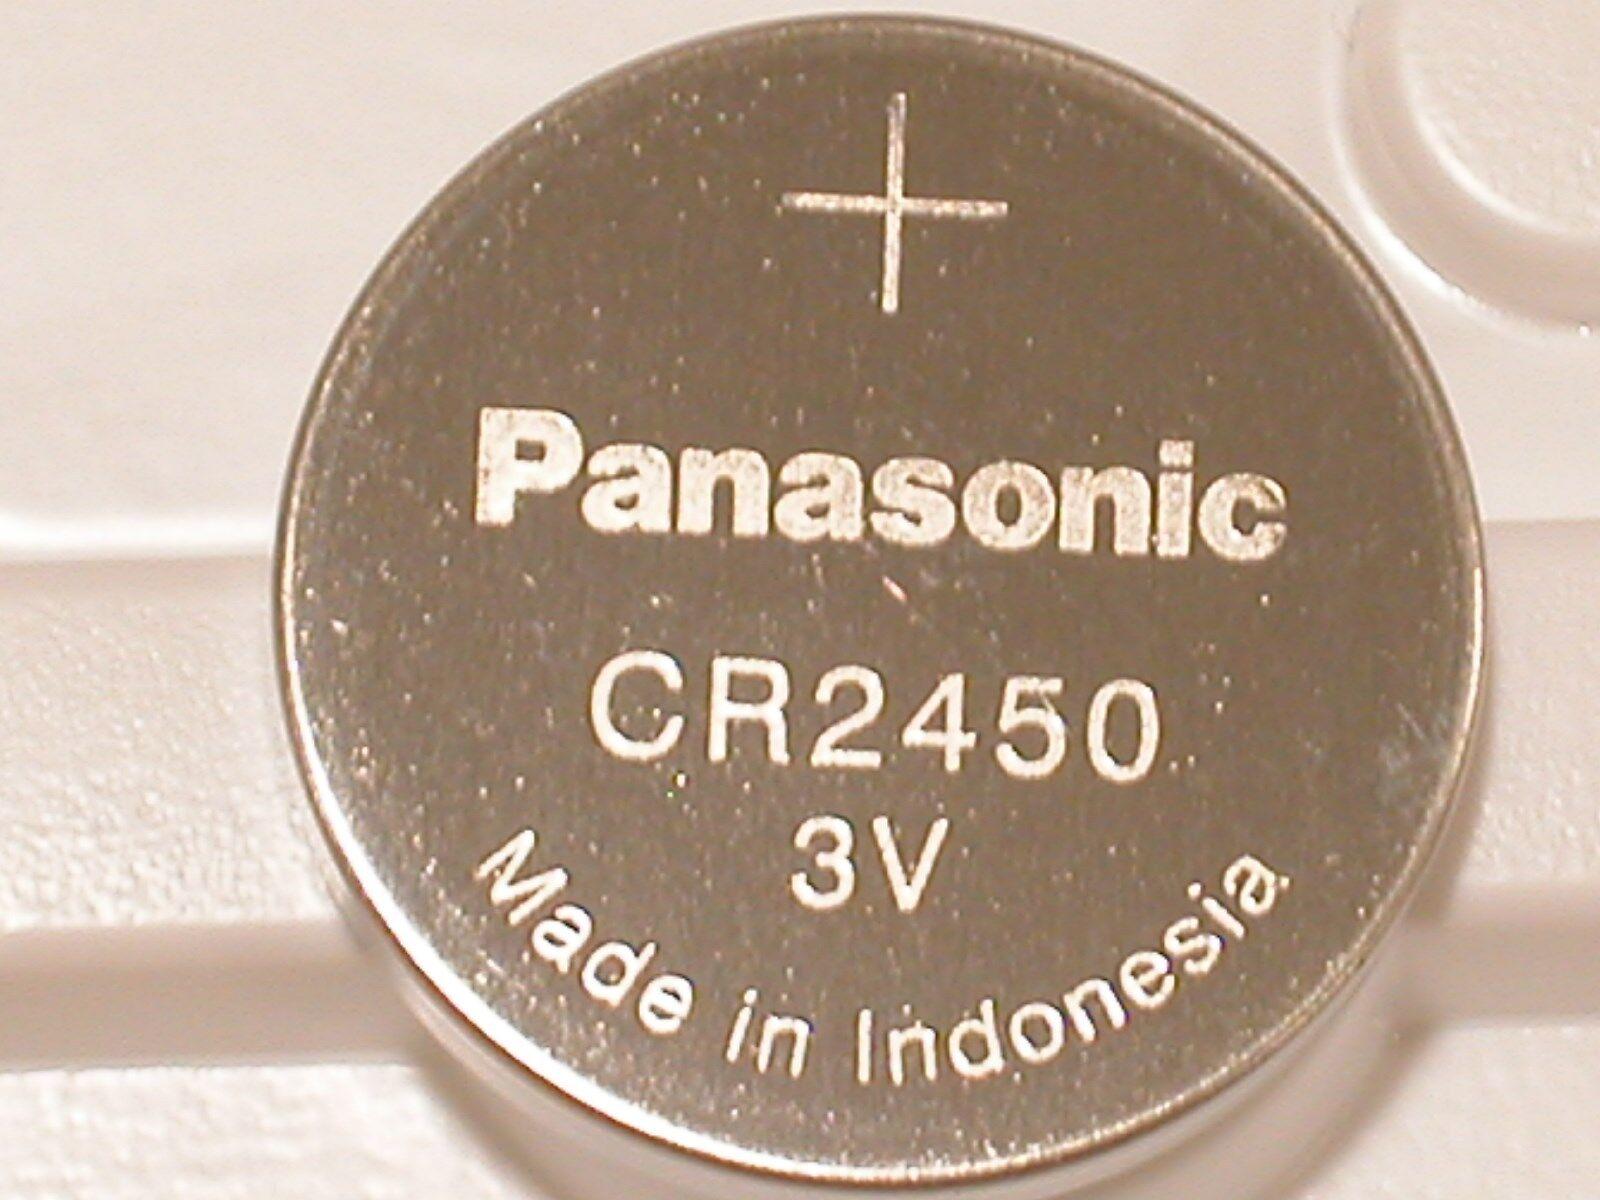 2 NEW PANASONIC CR2450 CR 2450 3v LITHIUM BATTERY EXPIRE 2024